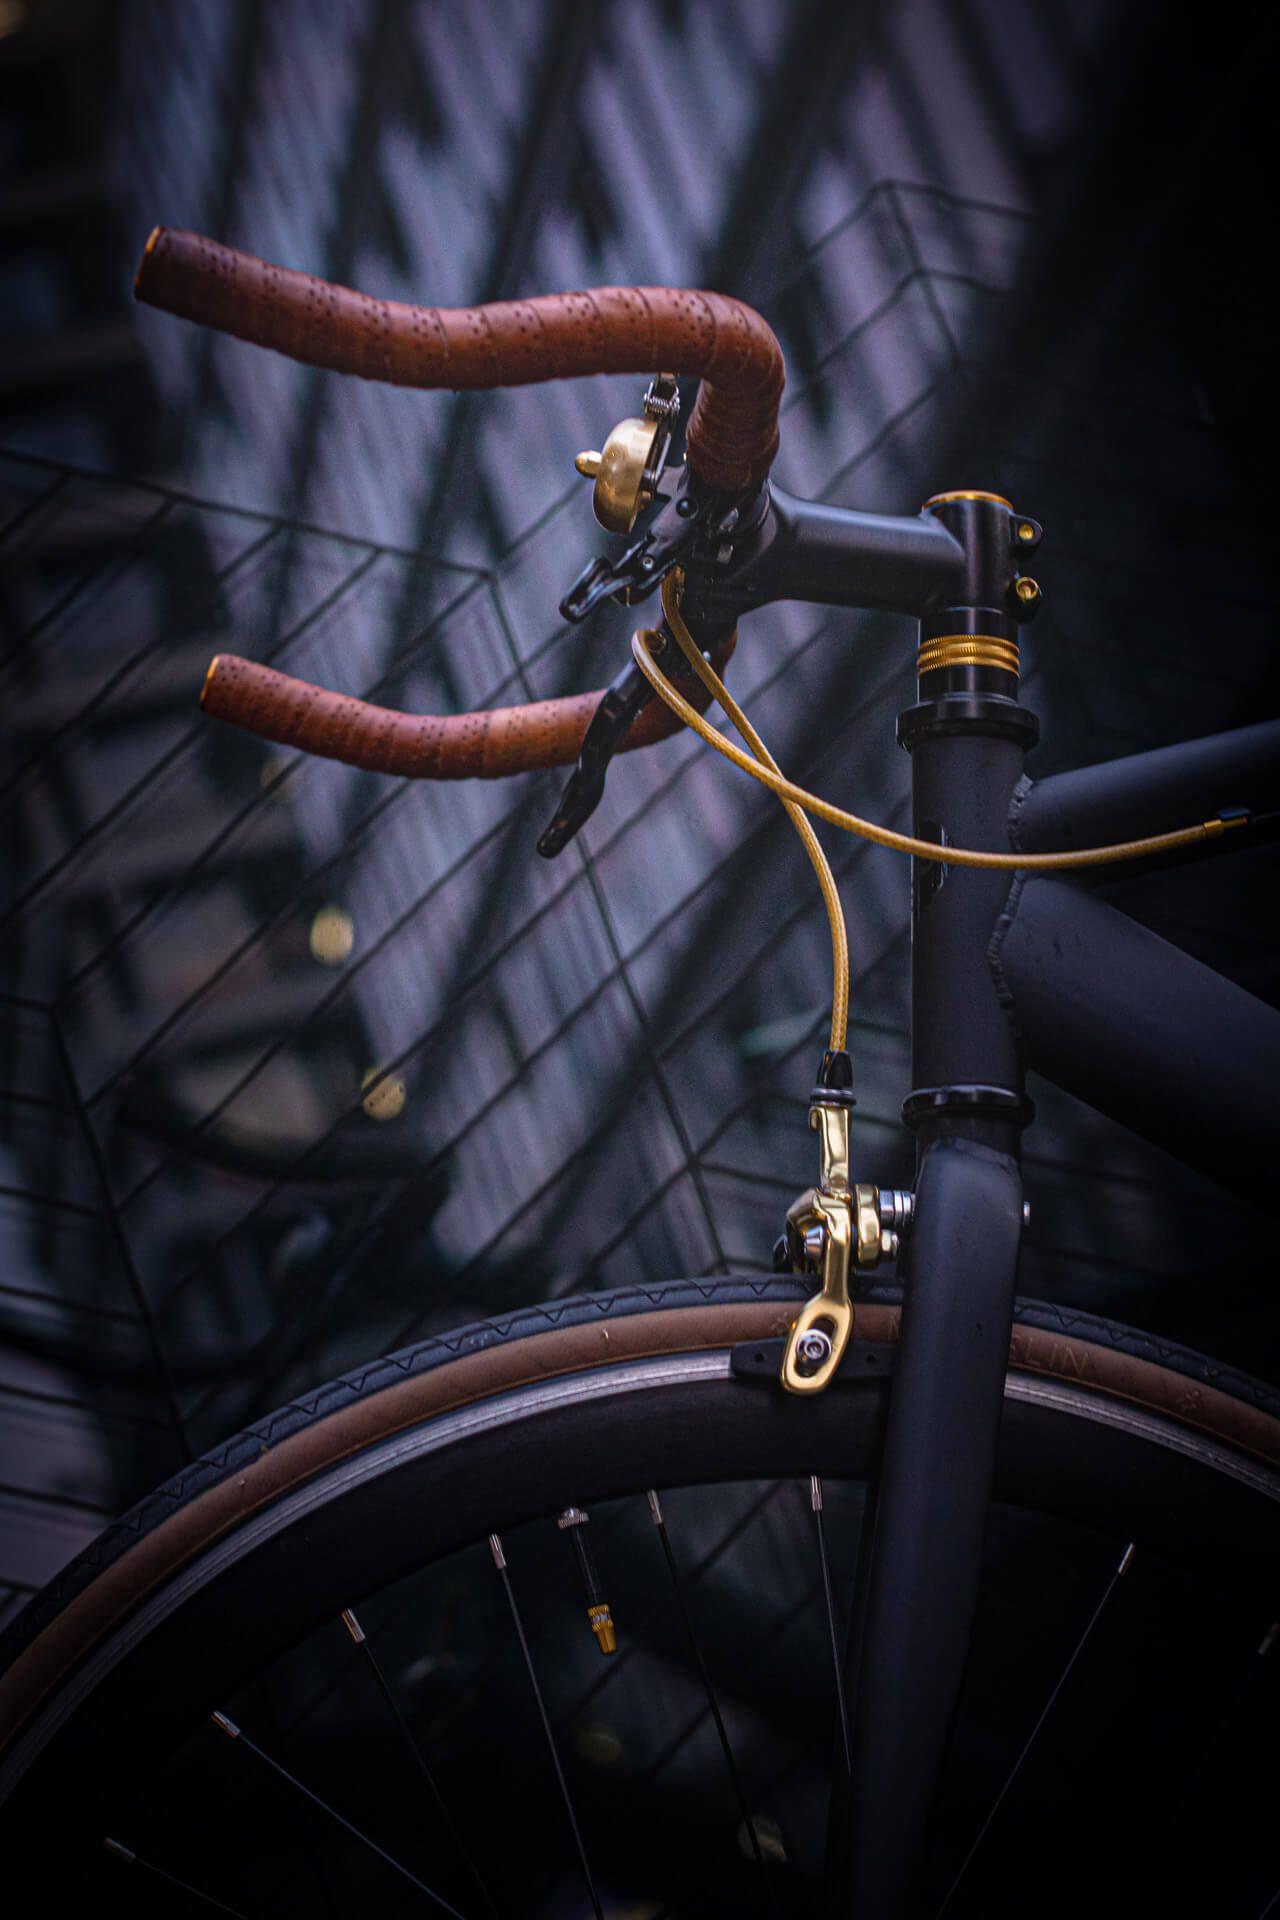 Little John Bikes Oberhausen Mitte GmbH - Fahrradhndler